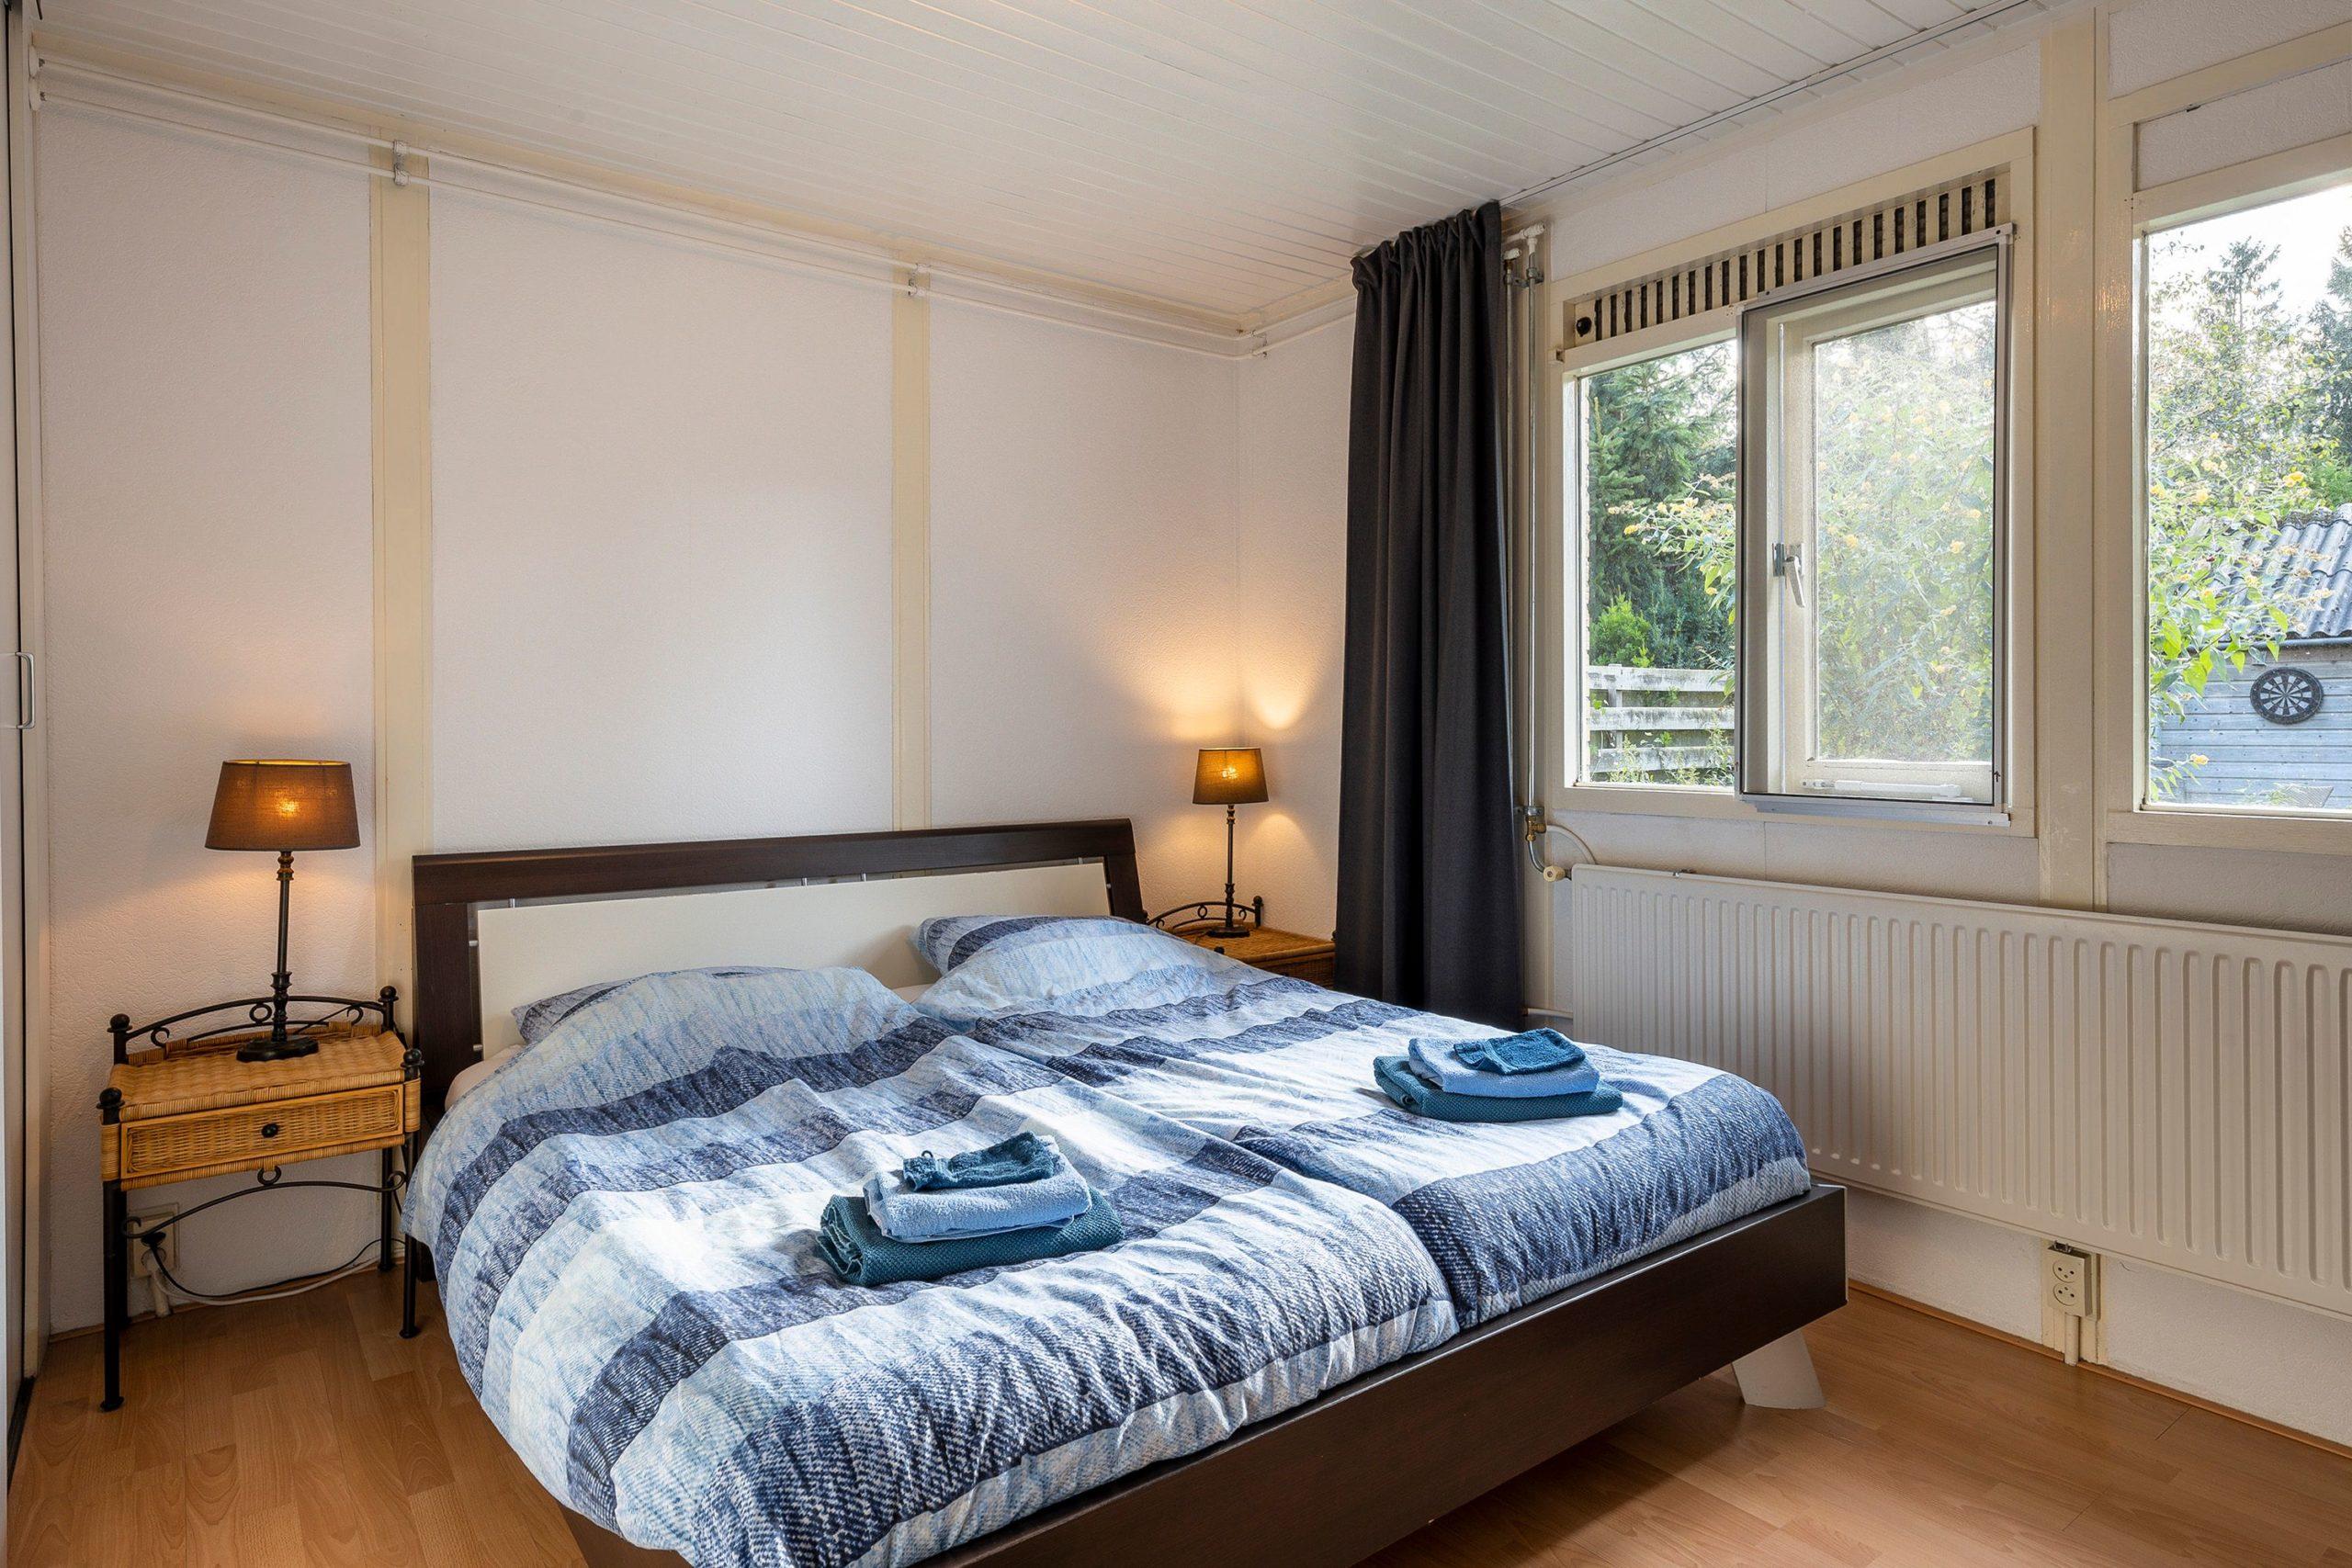 blauwe-boshuis-hoofdslaapkamer